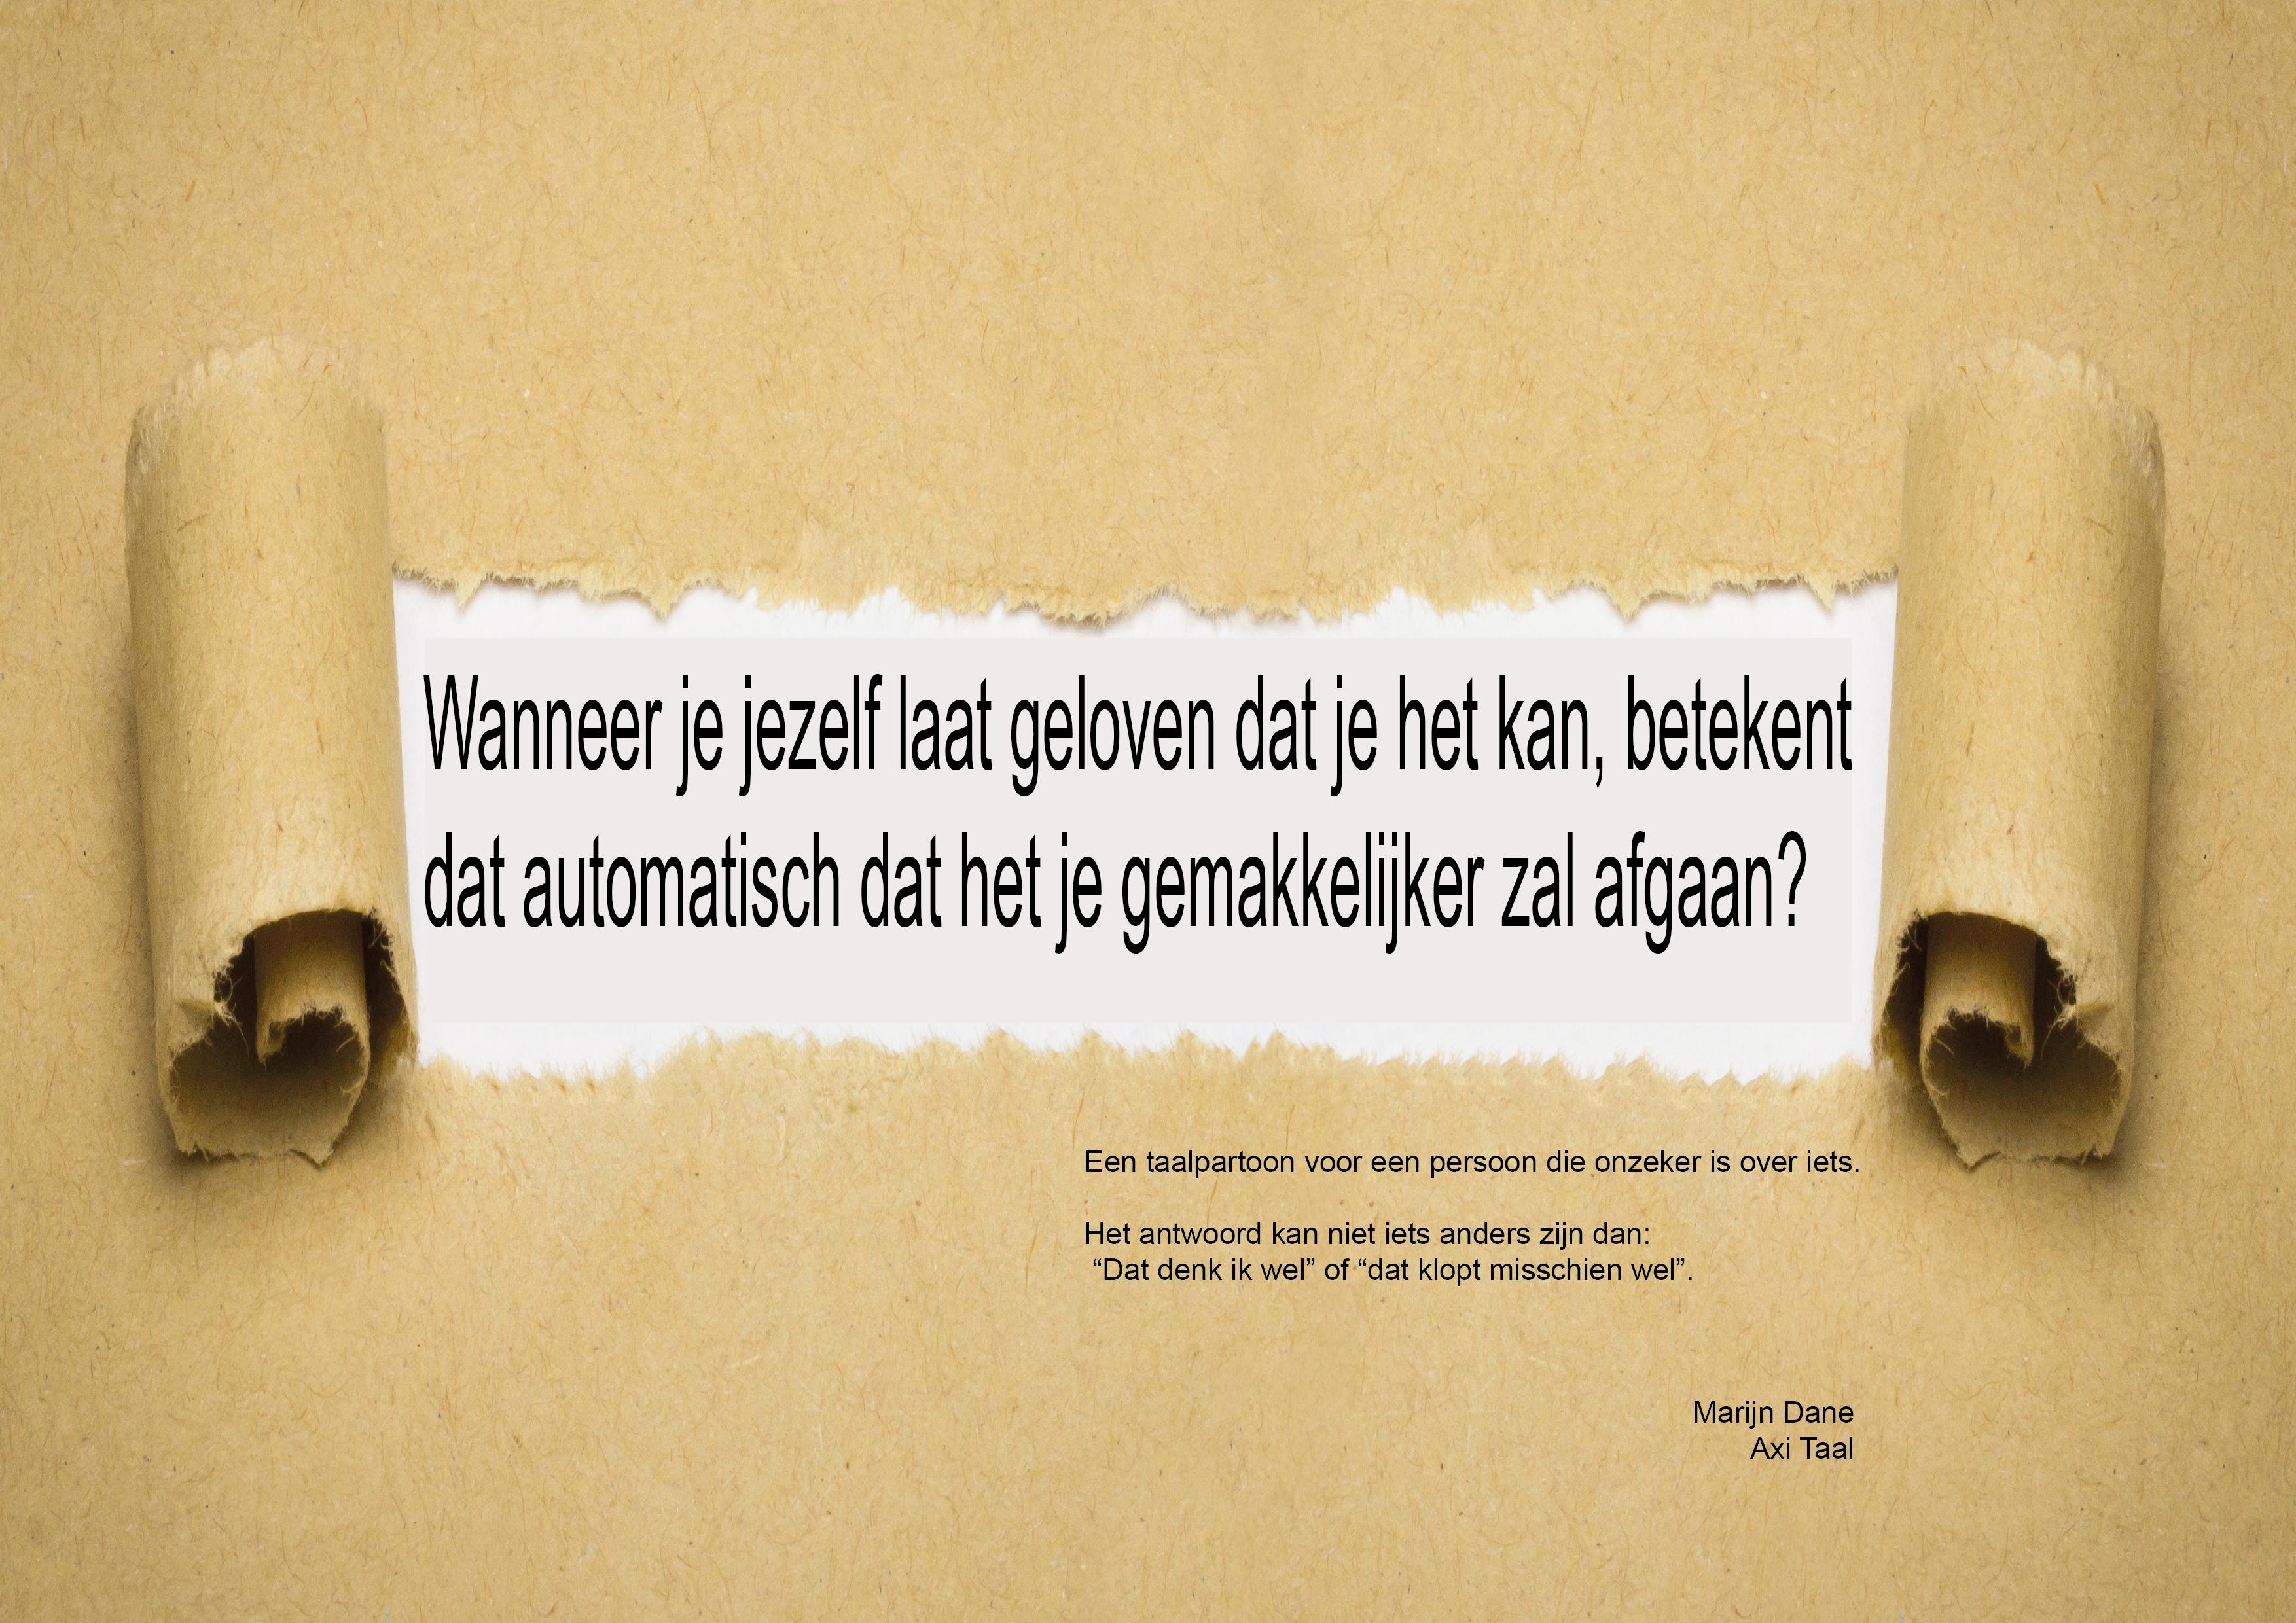 taalpatronen-axi-taal-nlp-in-bedrijf-1